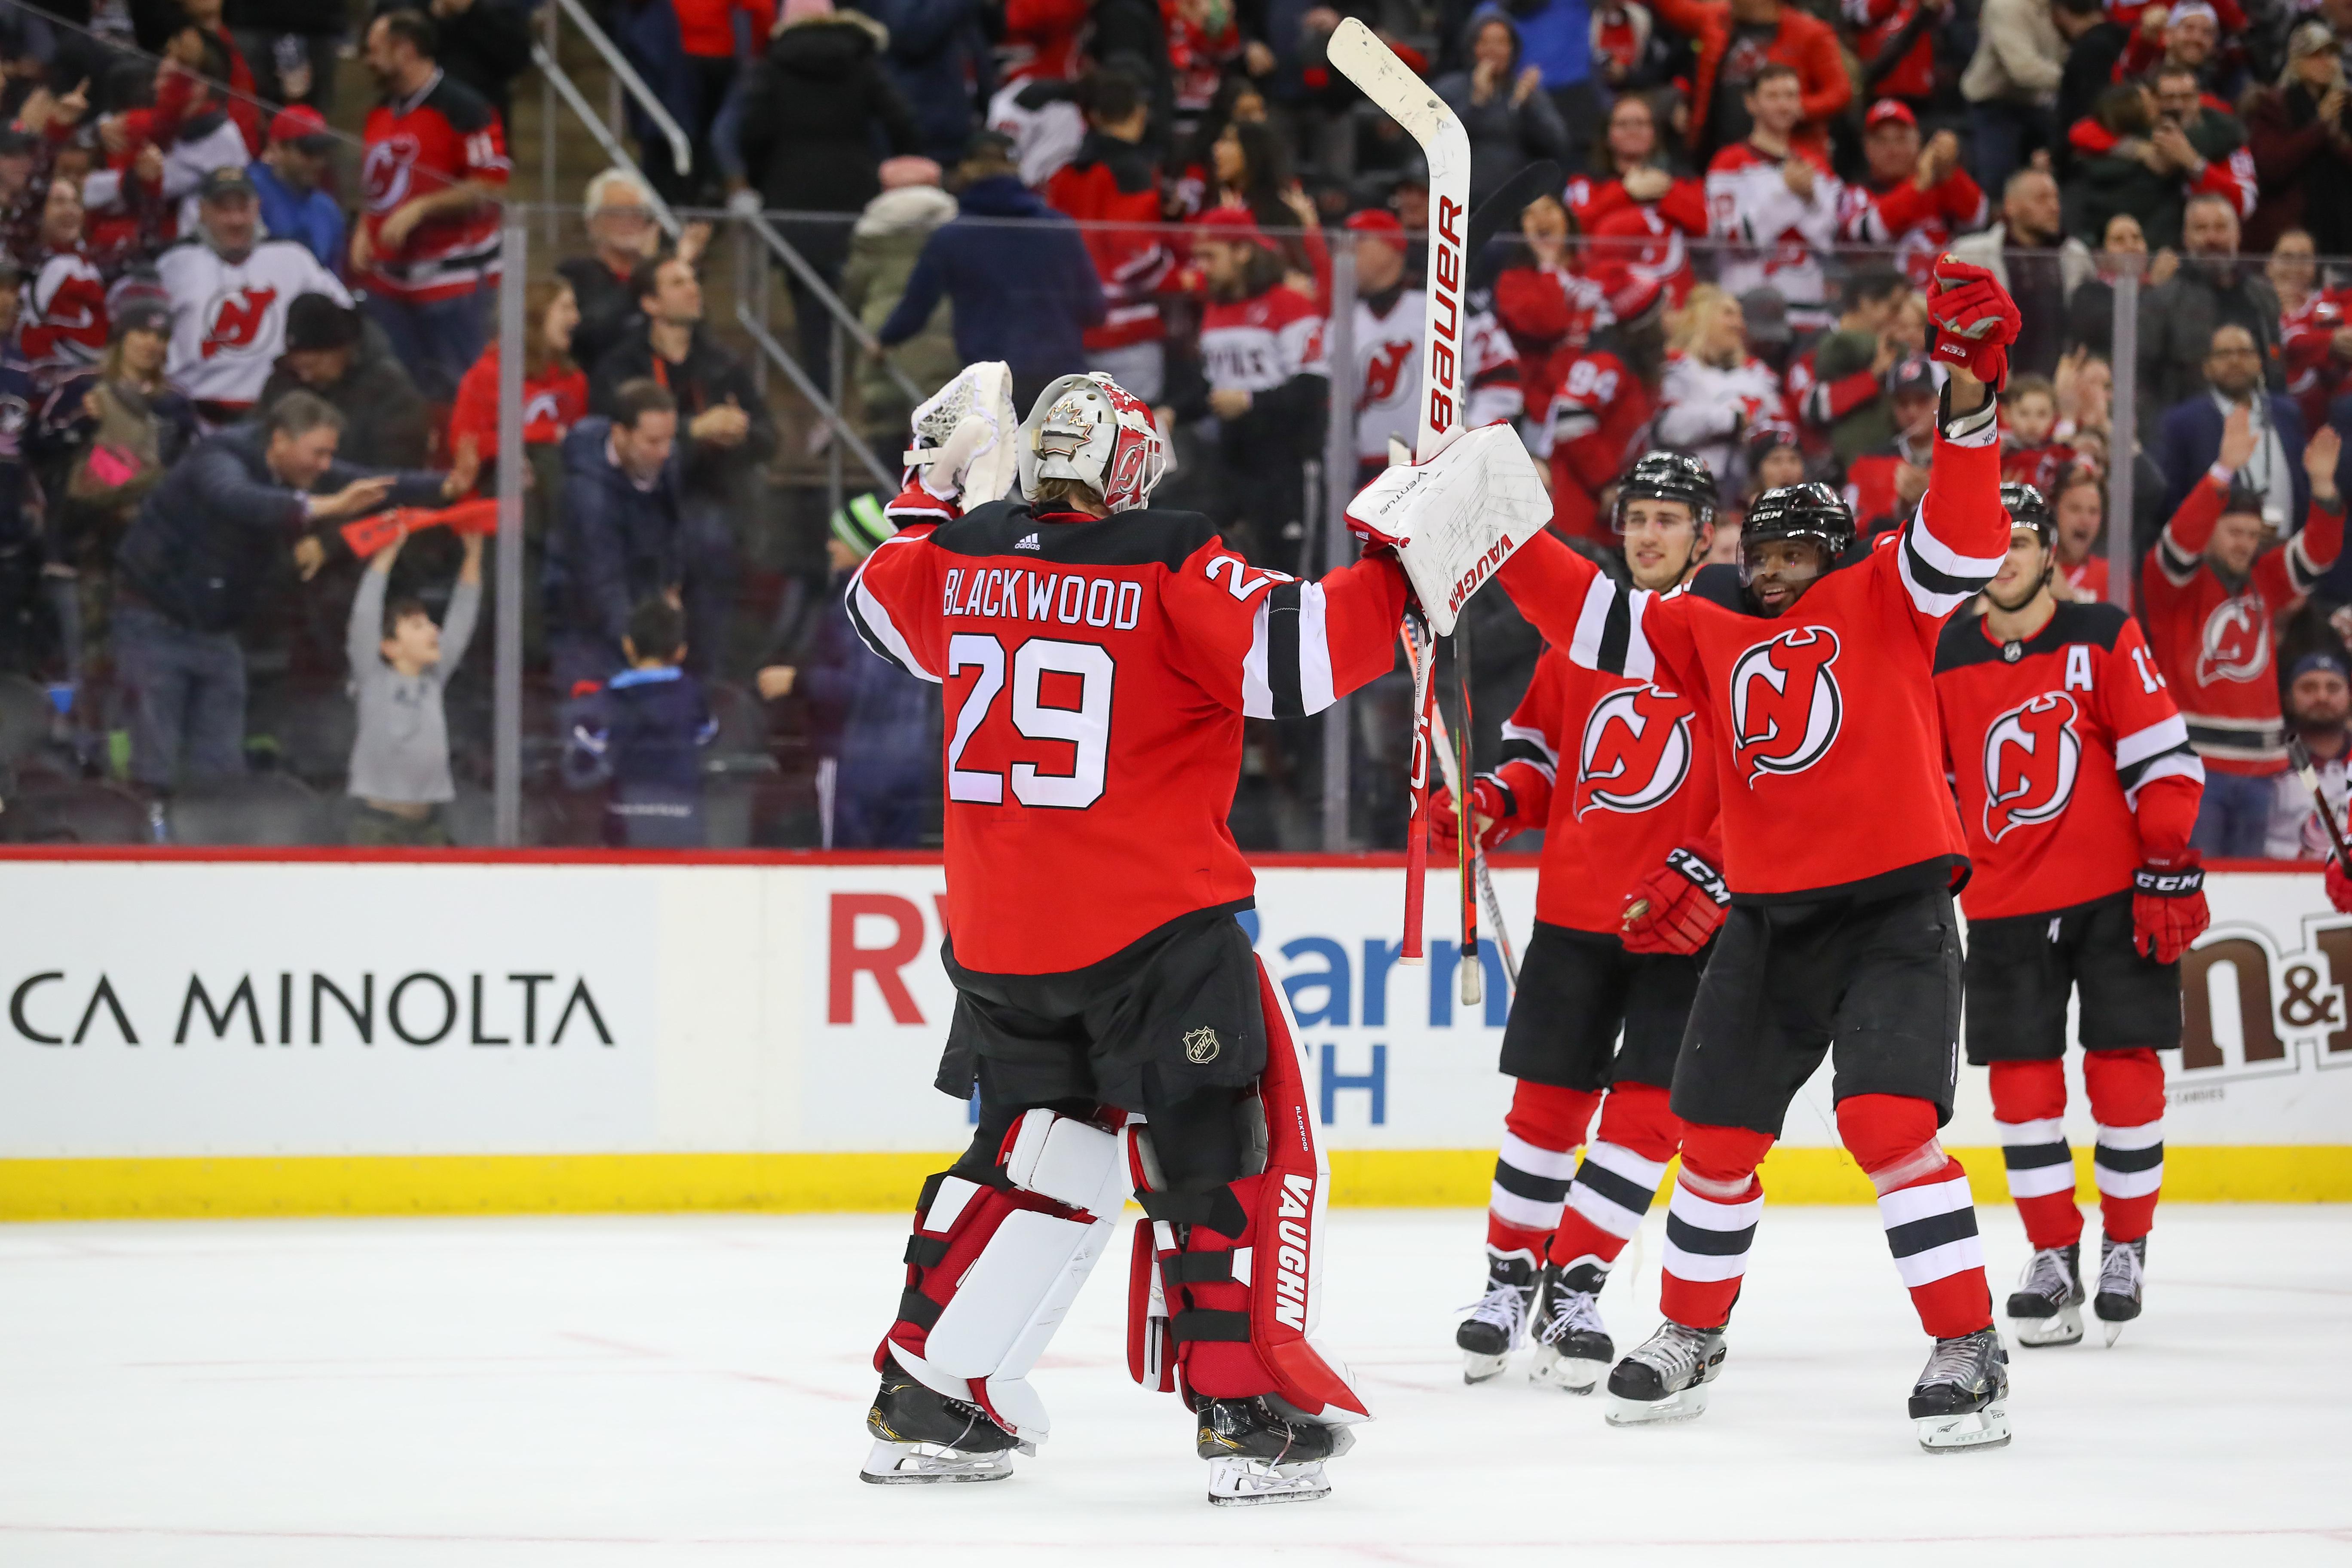 NHL: FEB 16 Blue Jackets at Devils